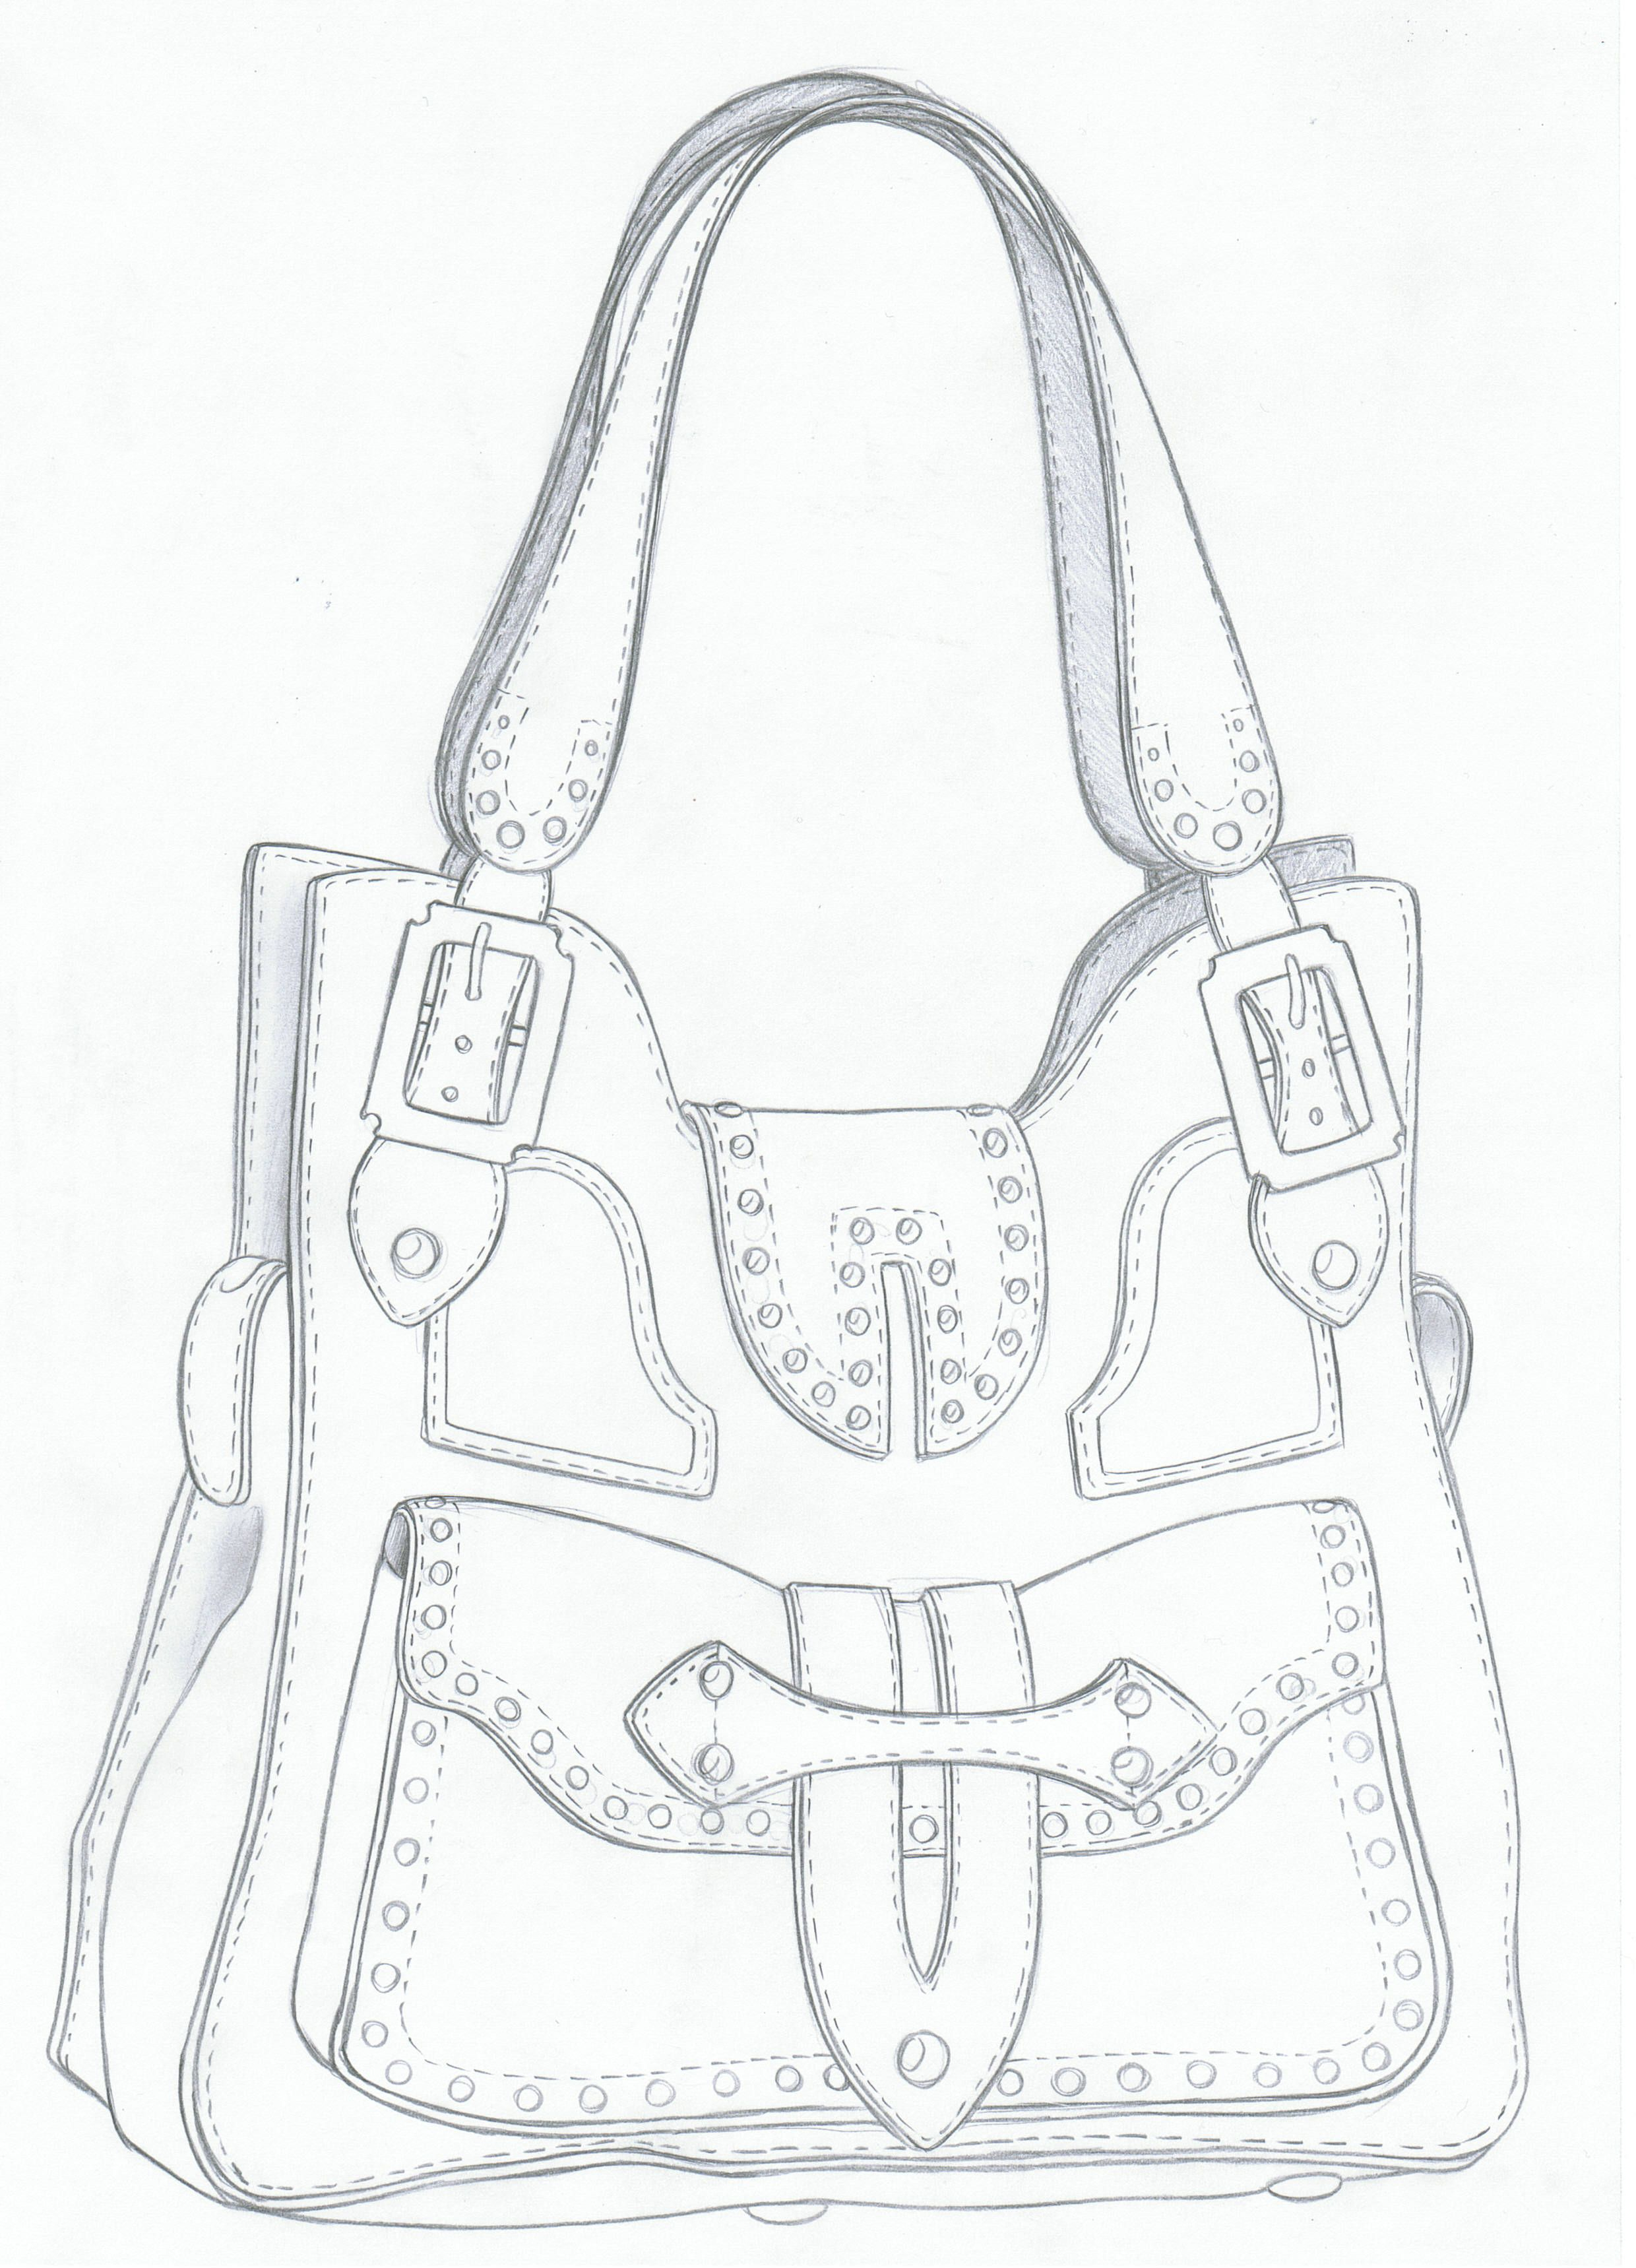 Pin von Leny Rodallen auf scarpe, abiti & accessories | Pinterest ...